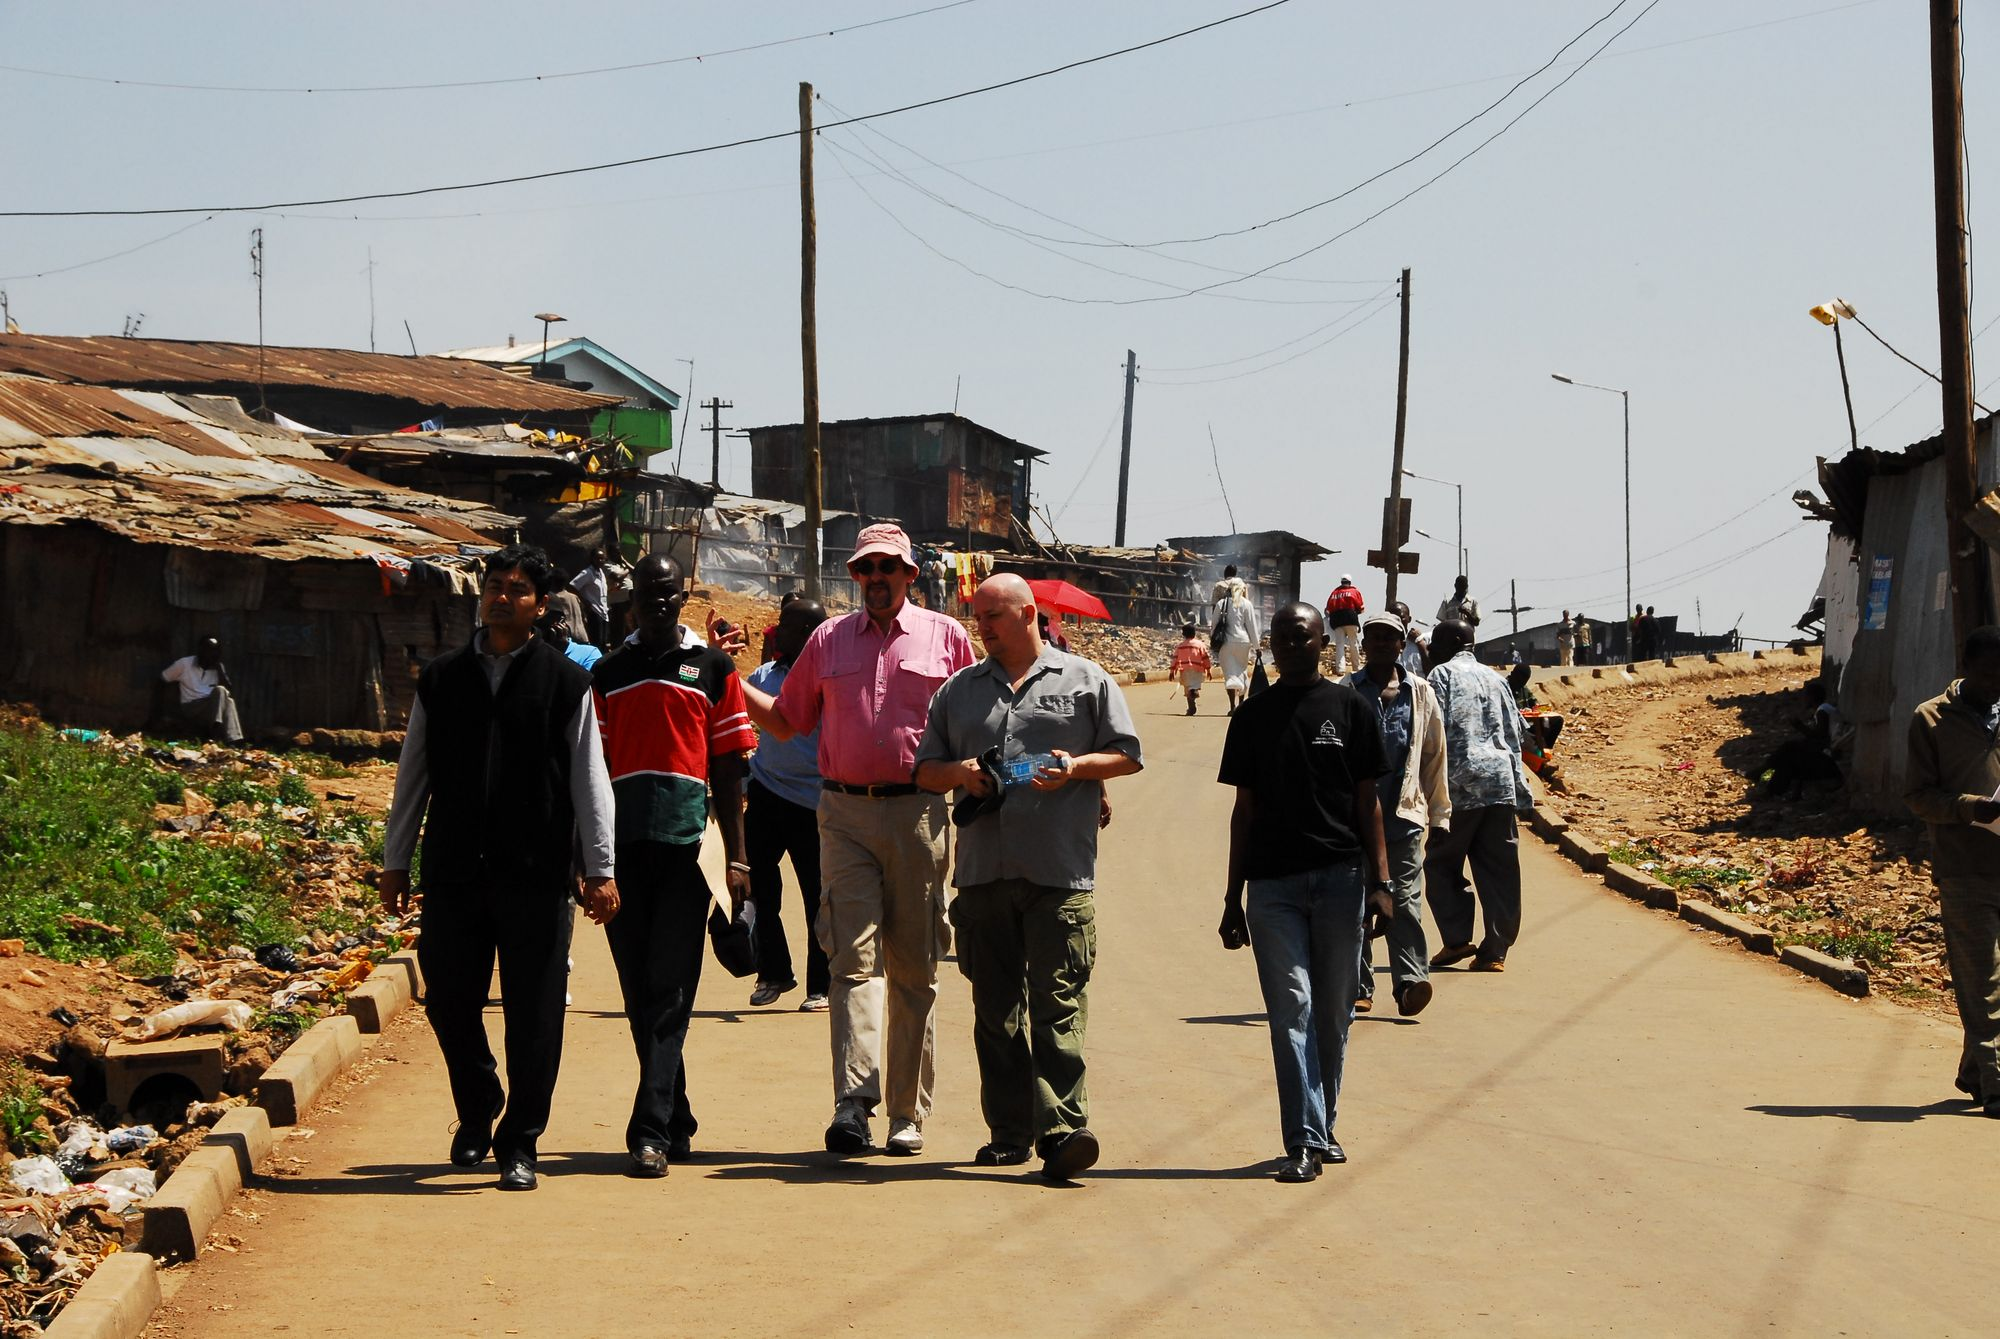 Visit to the Kibera slum in southwest Nairobi